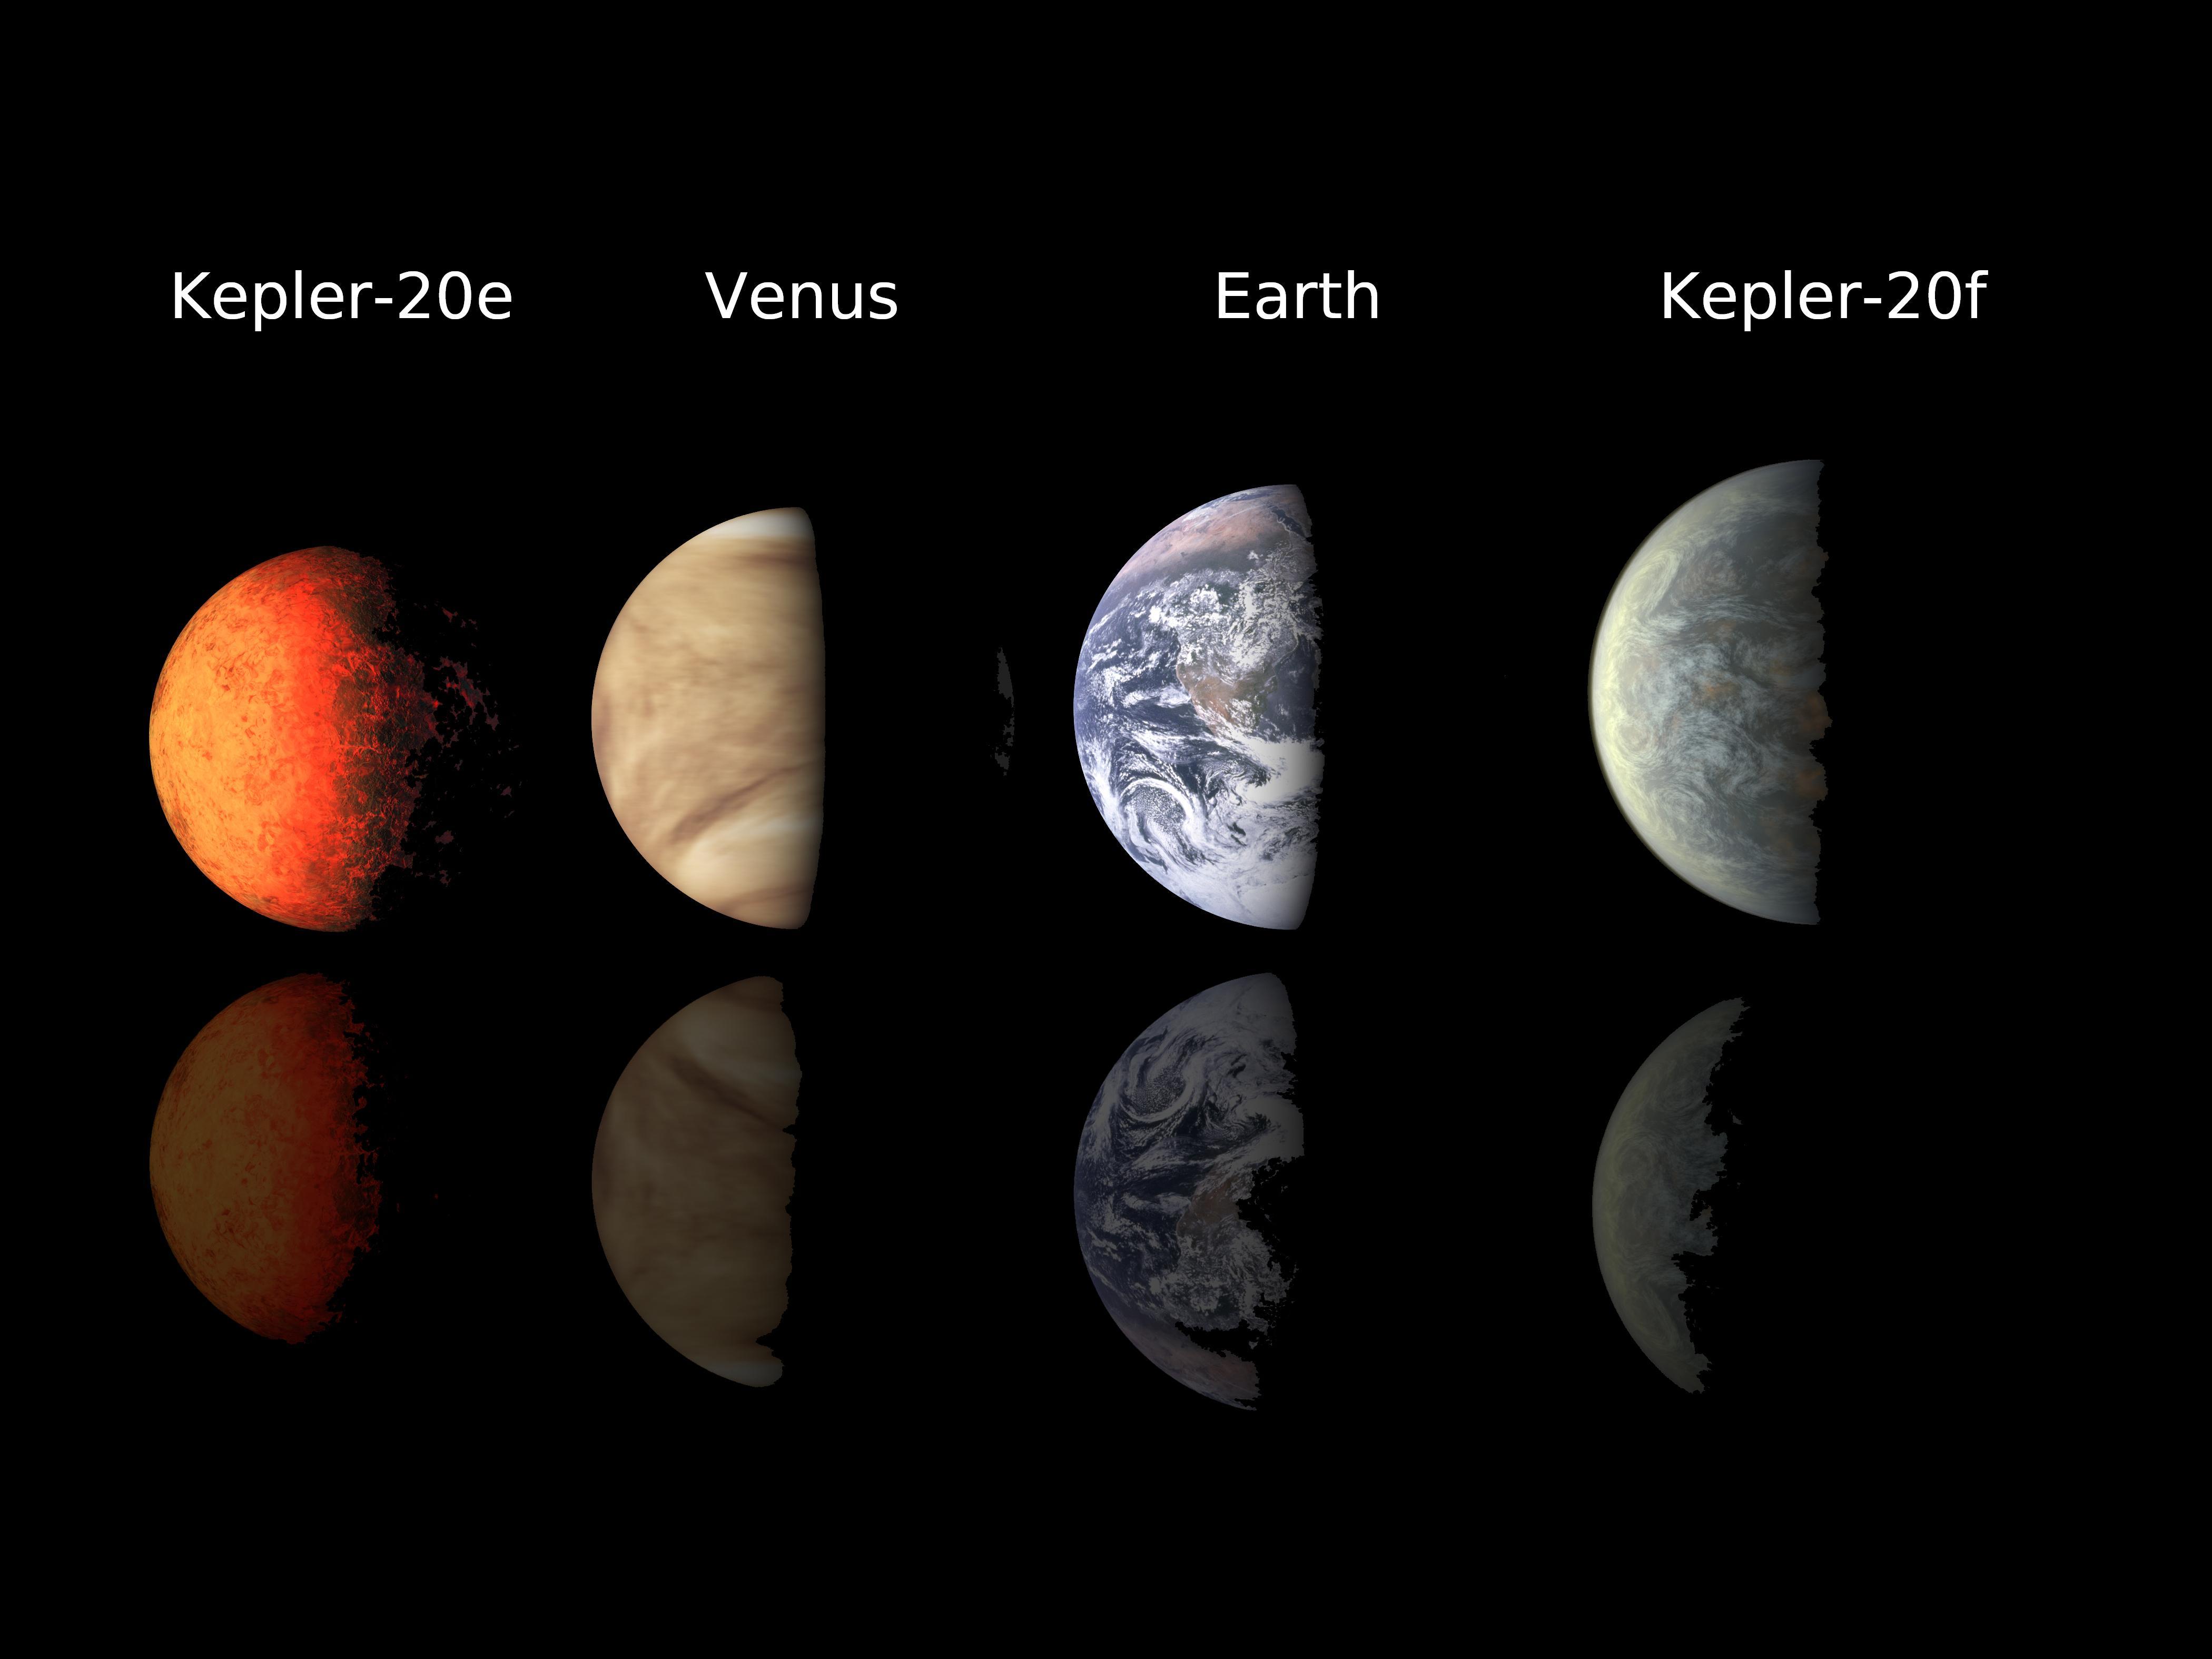 planet venus mass - photo #35